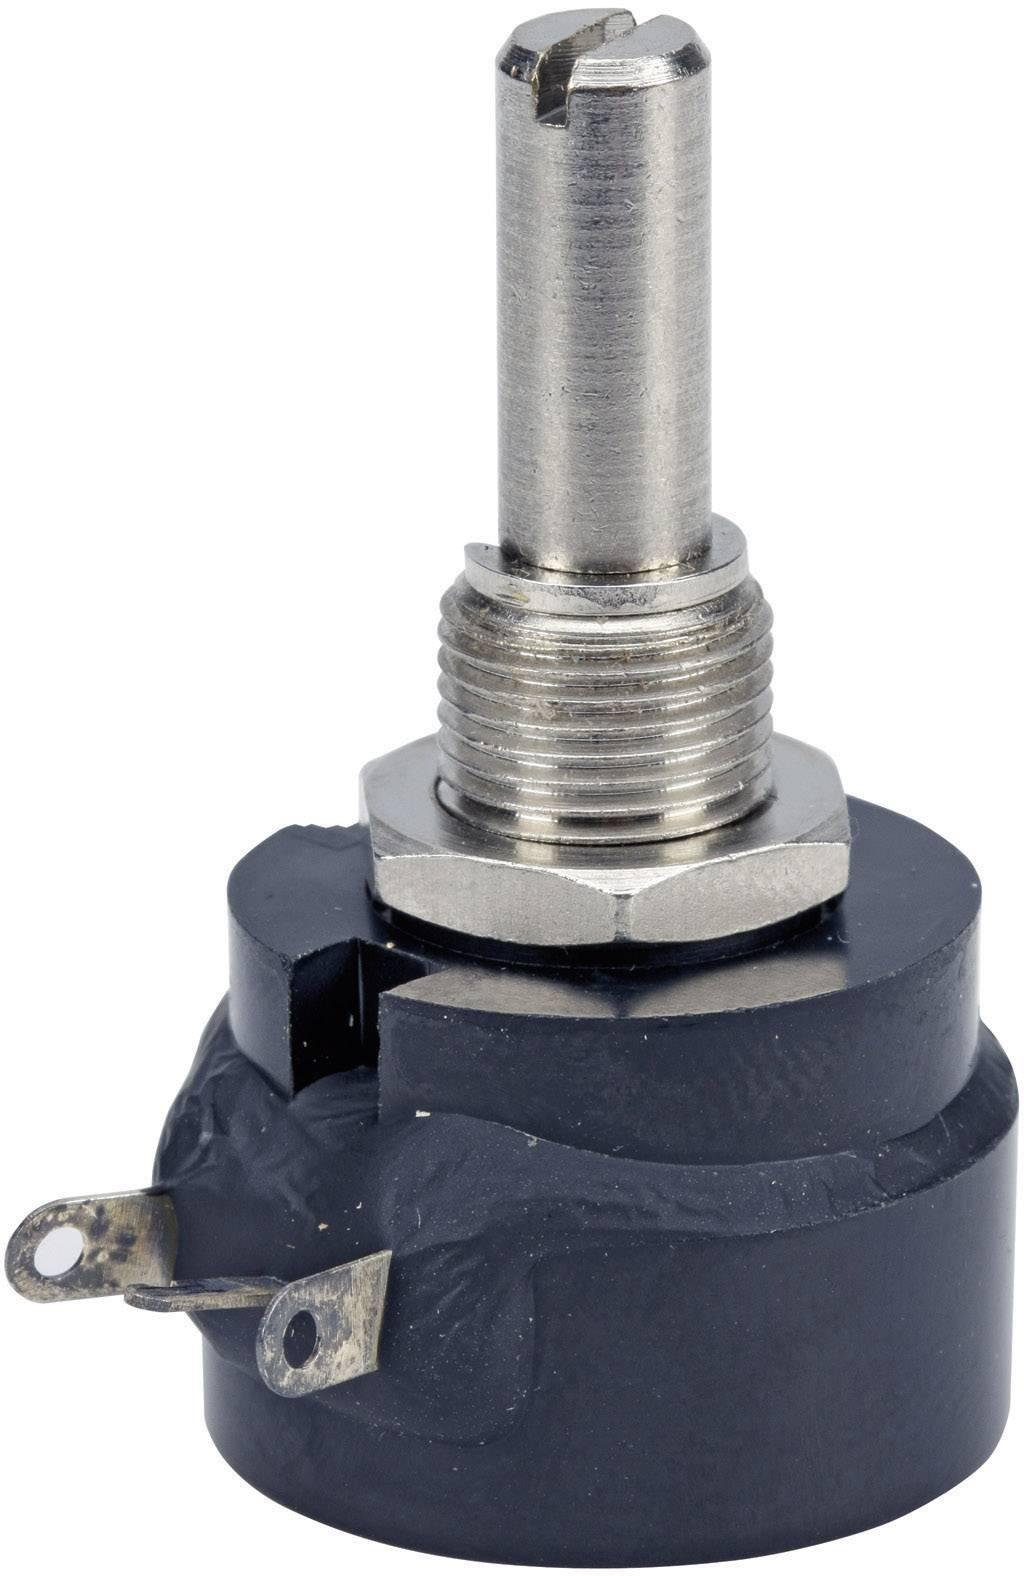 Drôtový potenciometer mono TT Electronics AB 3101206125 3101206125, 0.5 W, 250 Ohm, 1 ks